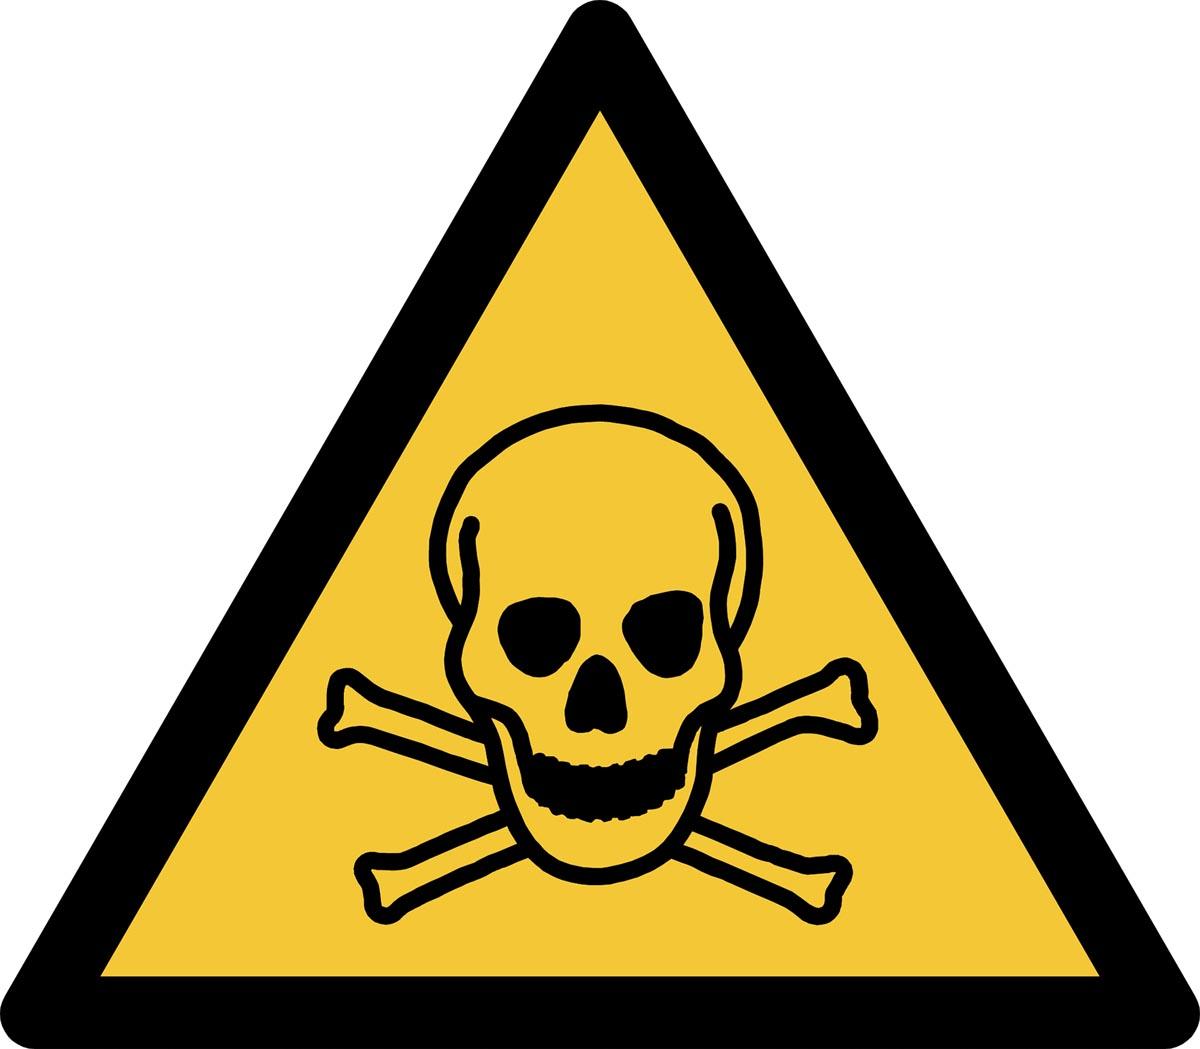 Tarifold waarschuwingsbord uit PP, giftige stoffen, ft 20 x 17,6 cm